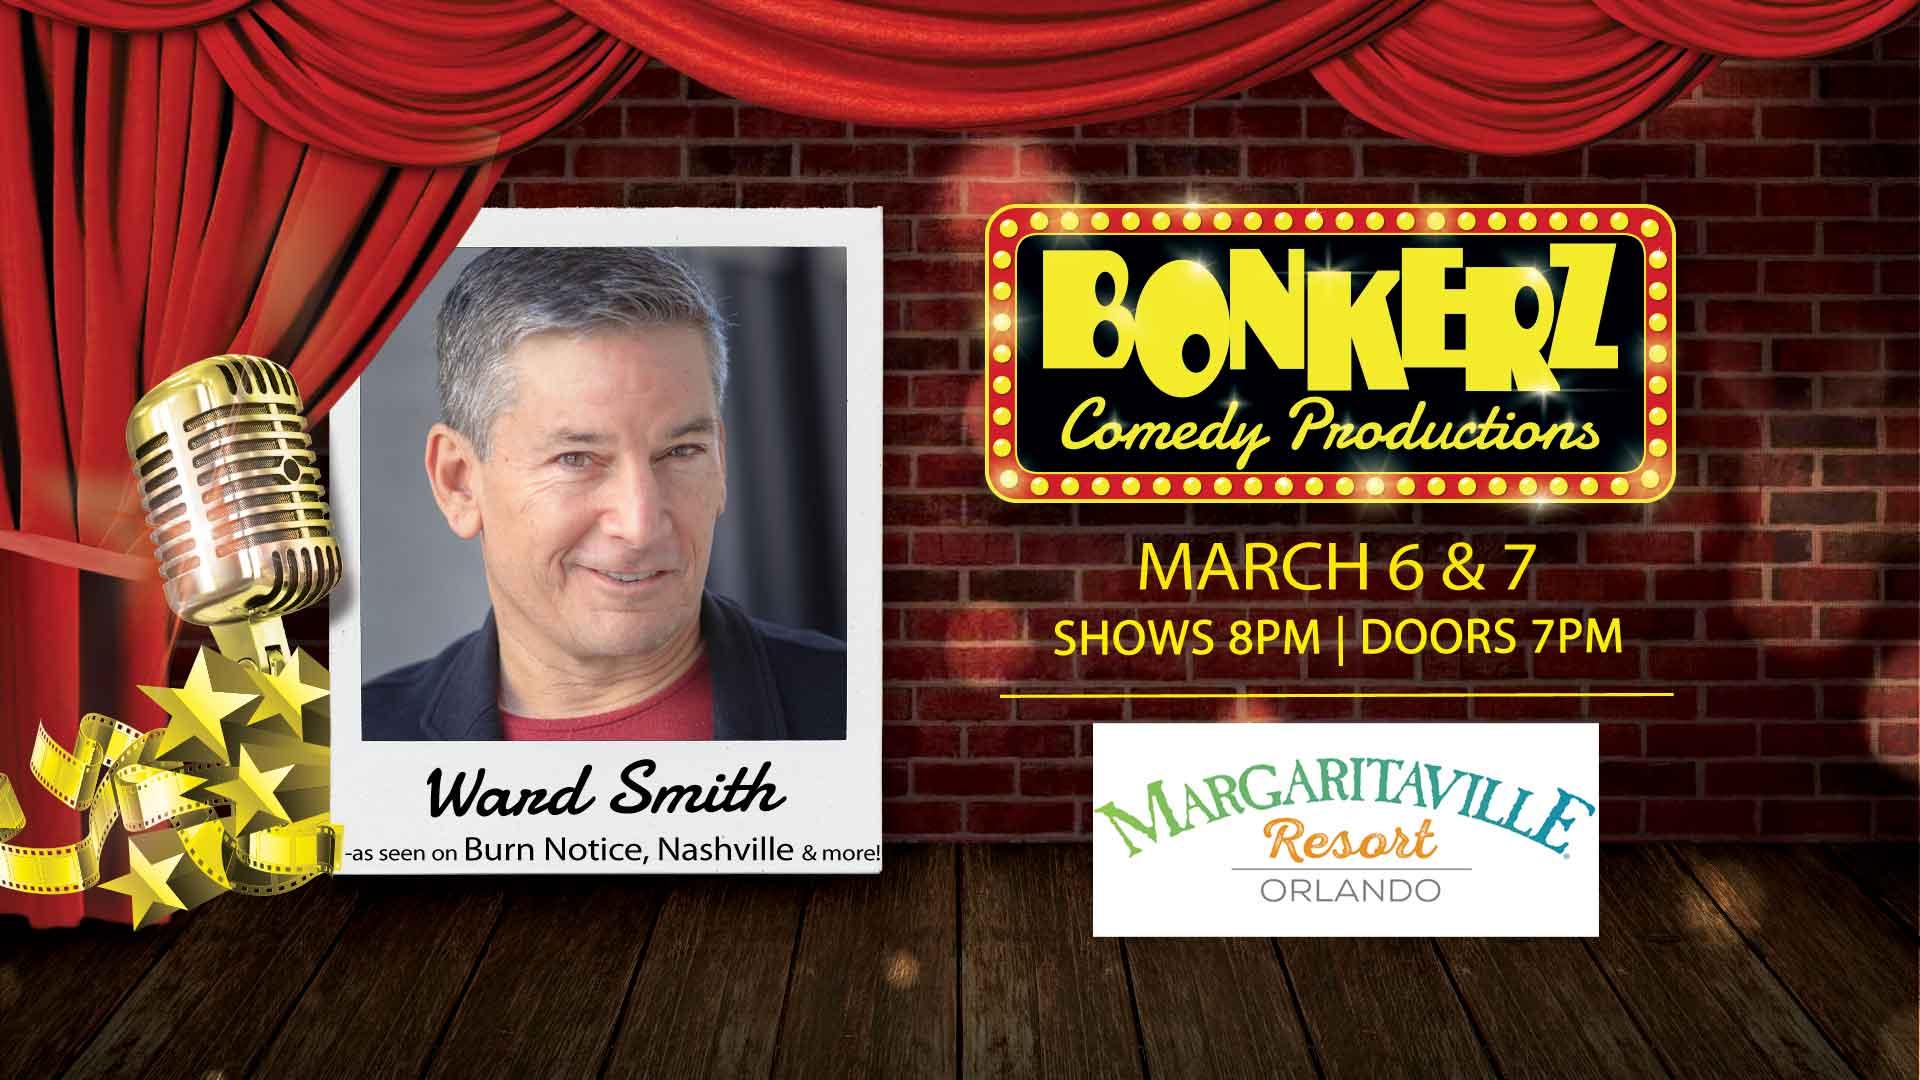 Ward Smith at Bonkerz Comedy Club